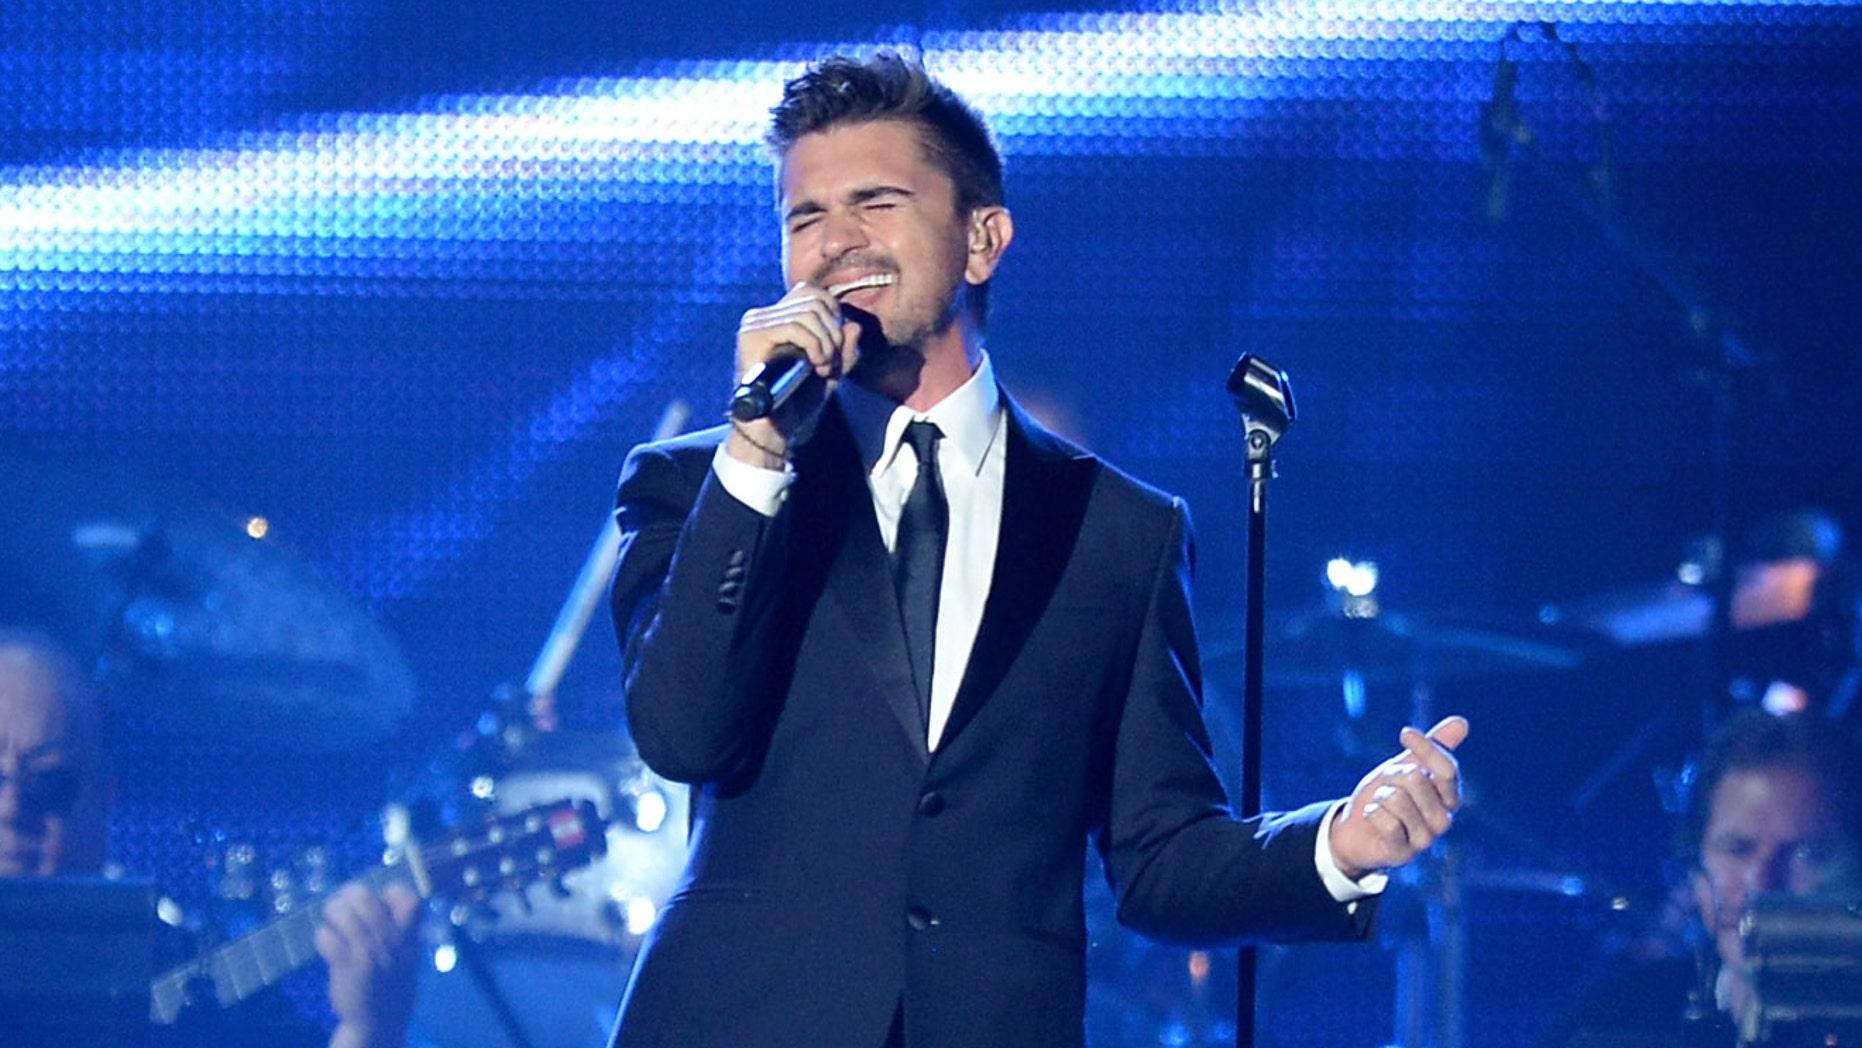 Juanes at the Mandalay Bay Convention Center on November 20, 2013 in Las Vegas, Nevada.